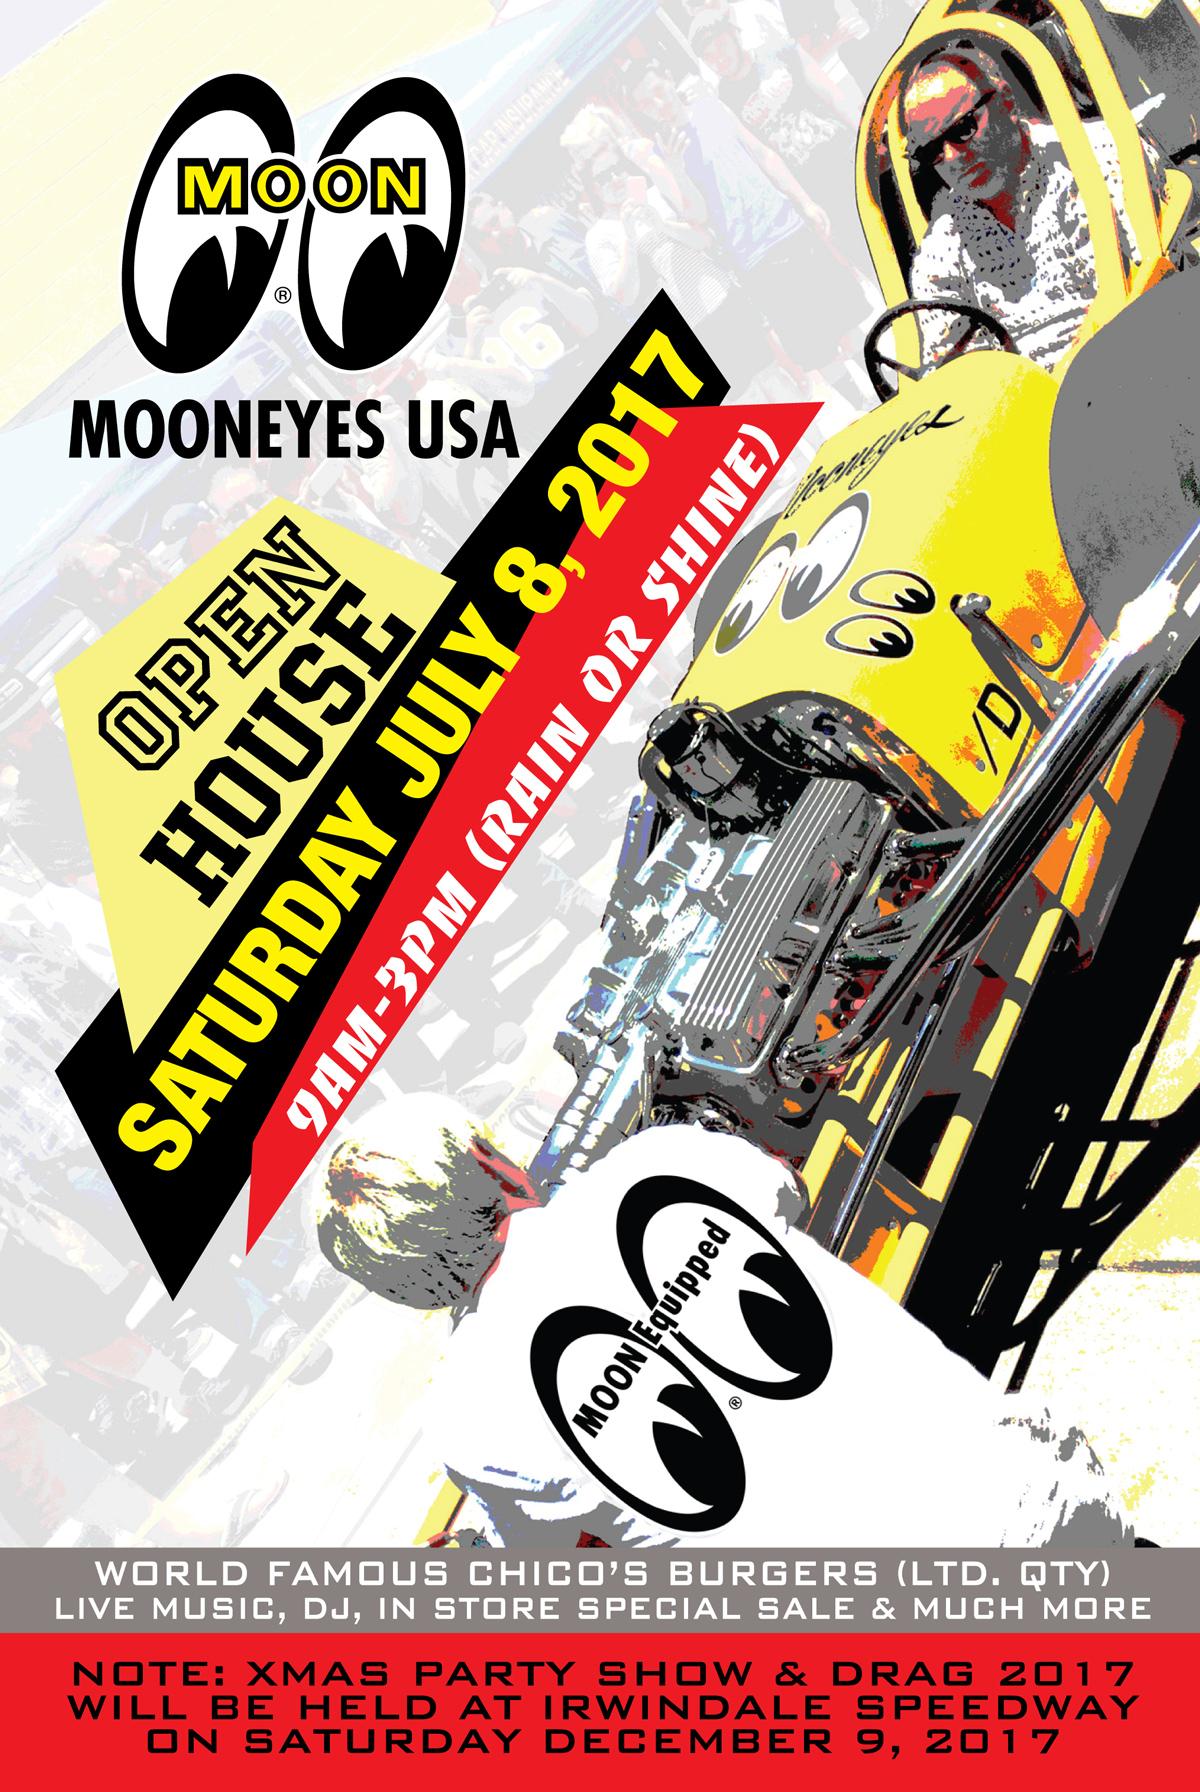 Mooneyes USA 2017 Catalog